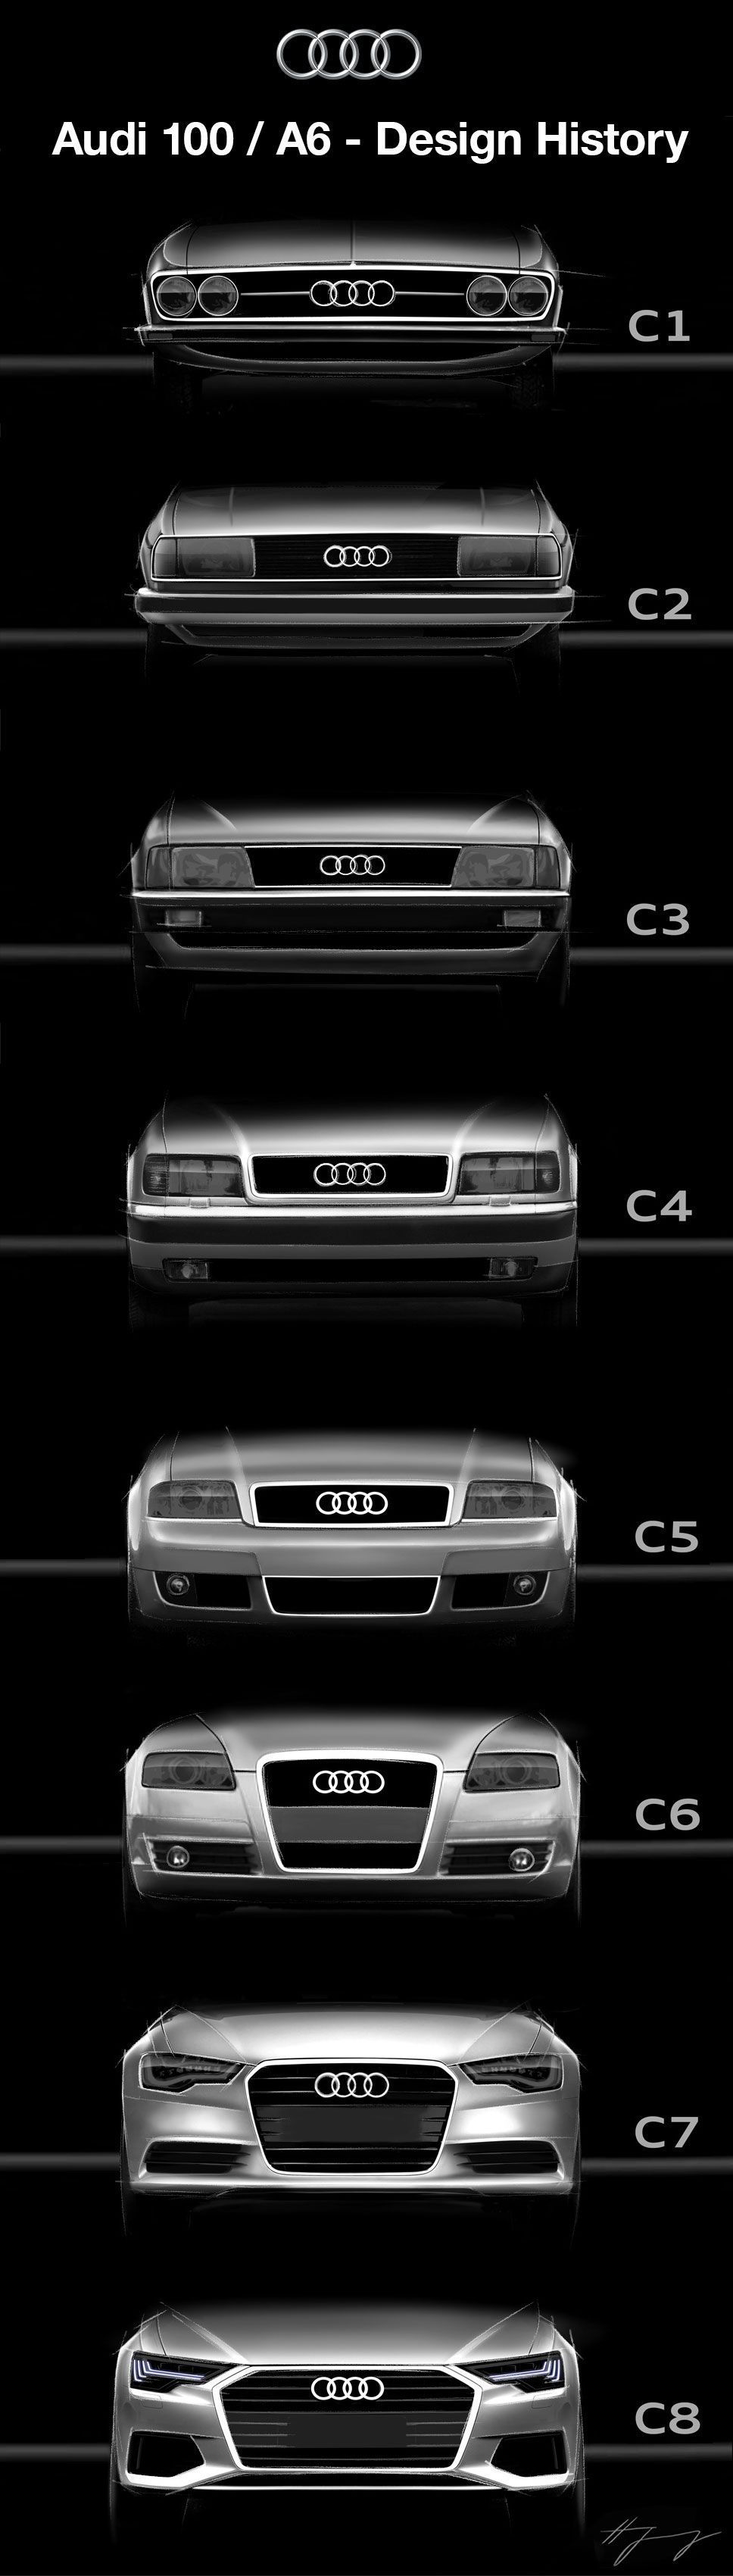 Audi A6 Design History Audi 100, Audi a6, Audi